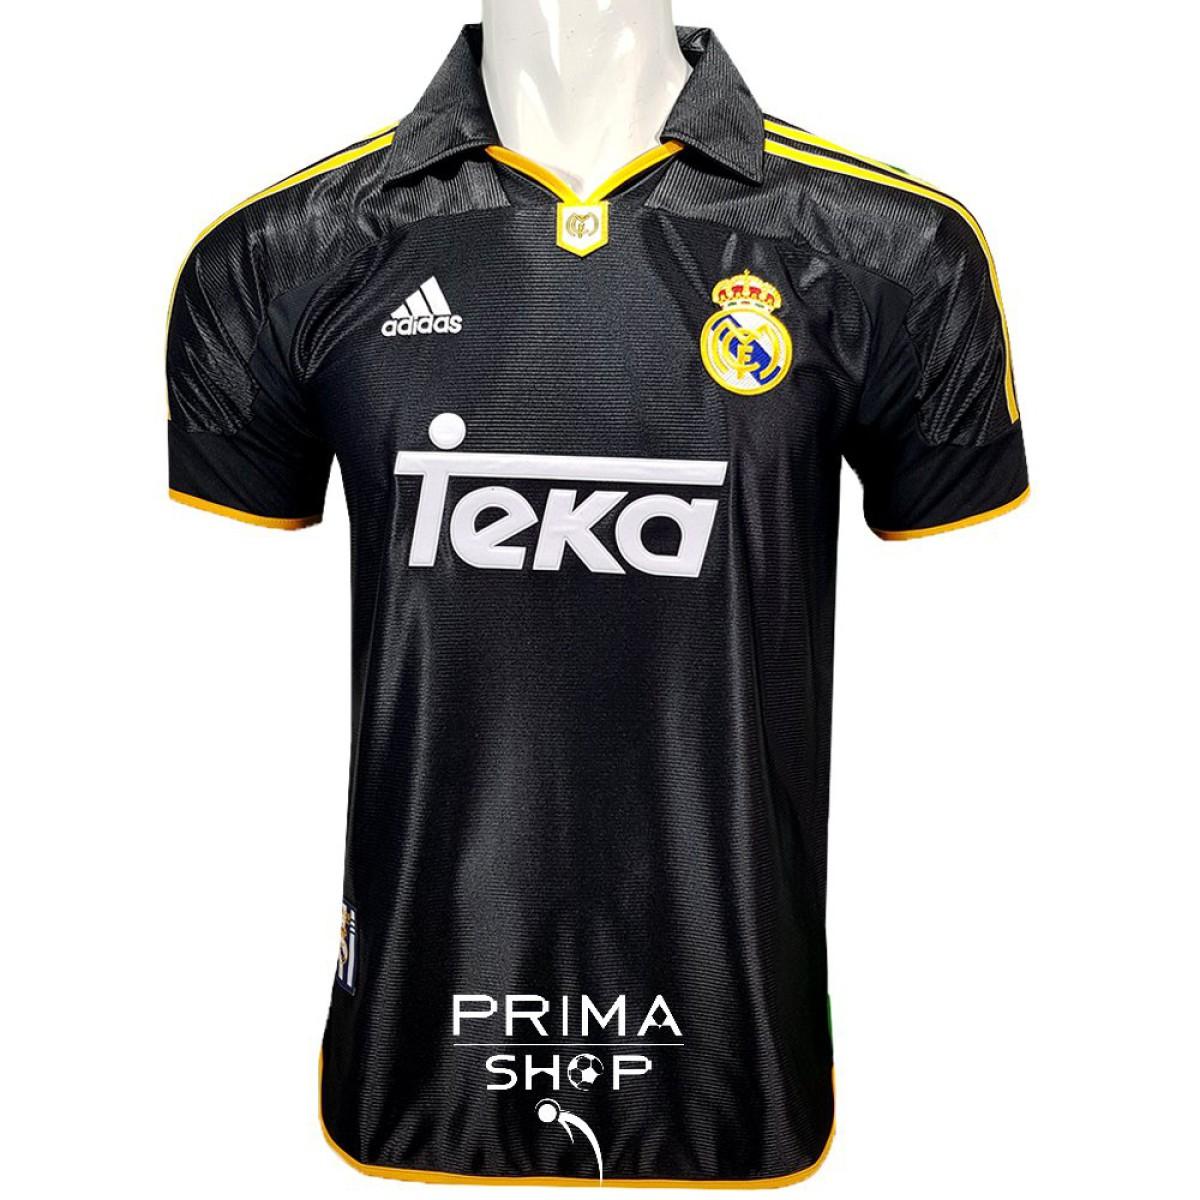 لباس کلاسیک دوم رئال مادرید 2000